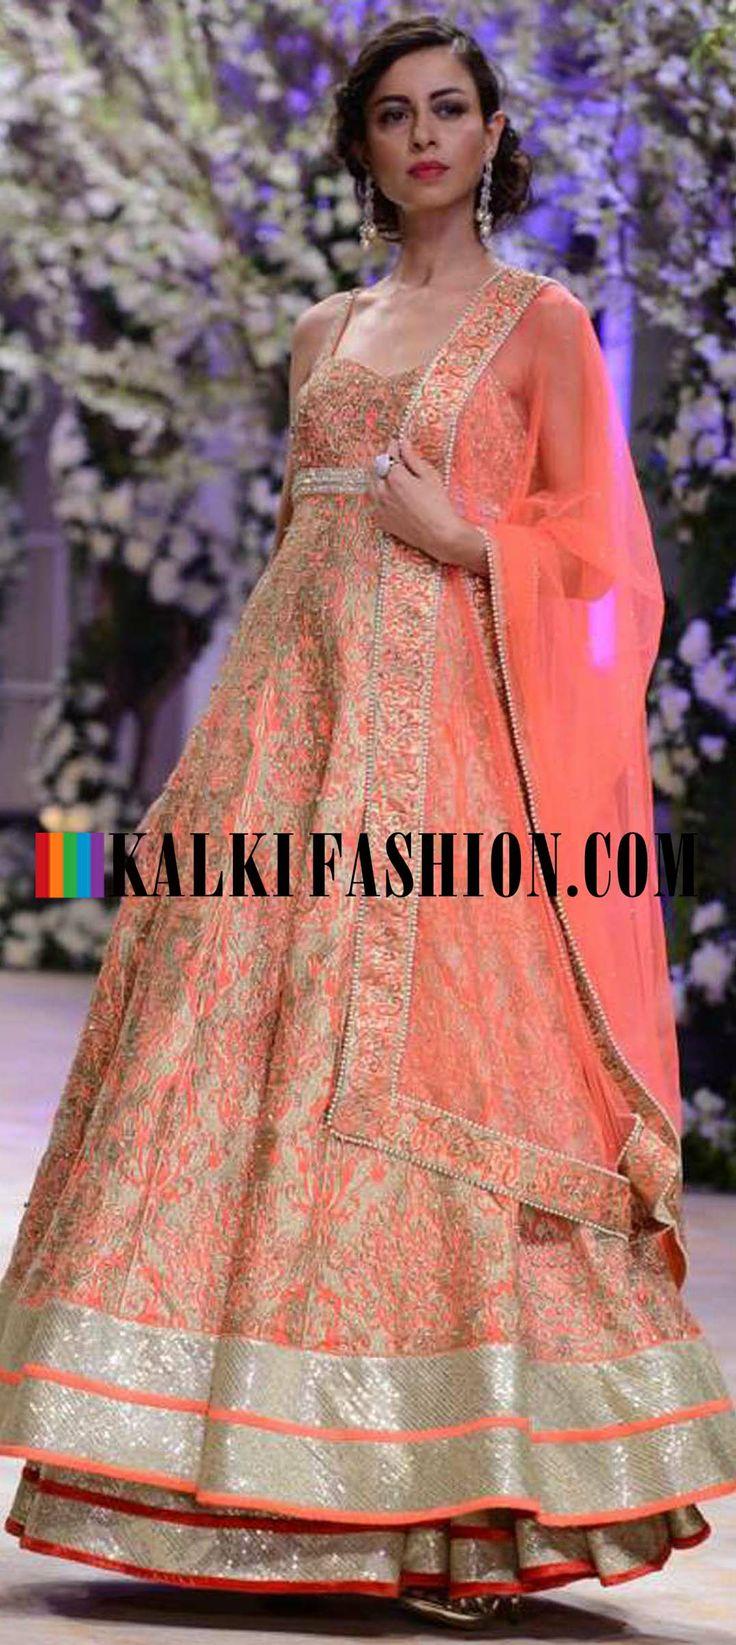 http://www.kalkifashion.com/designers/jyotsna-tiwari.html Urnashi Rautela and other models walk the ramp for Jyotsna Tiwari at Indian Bridal Week NOV 2013 at Mumbai 52